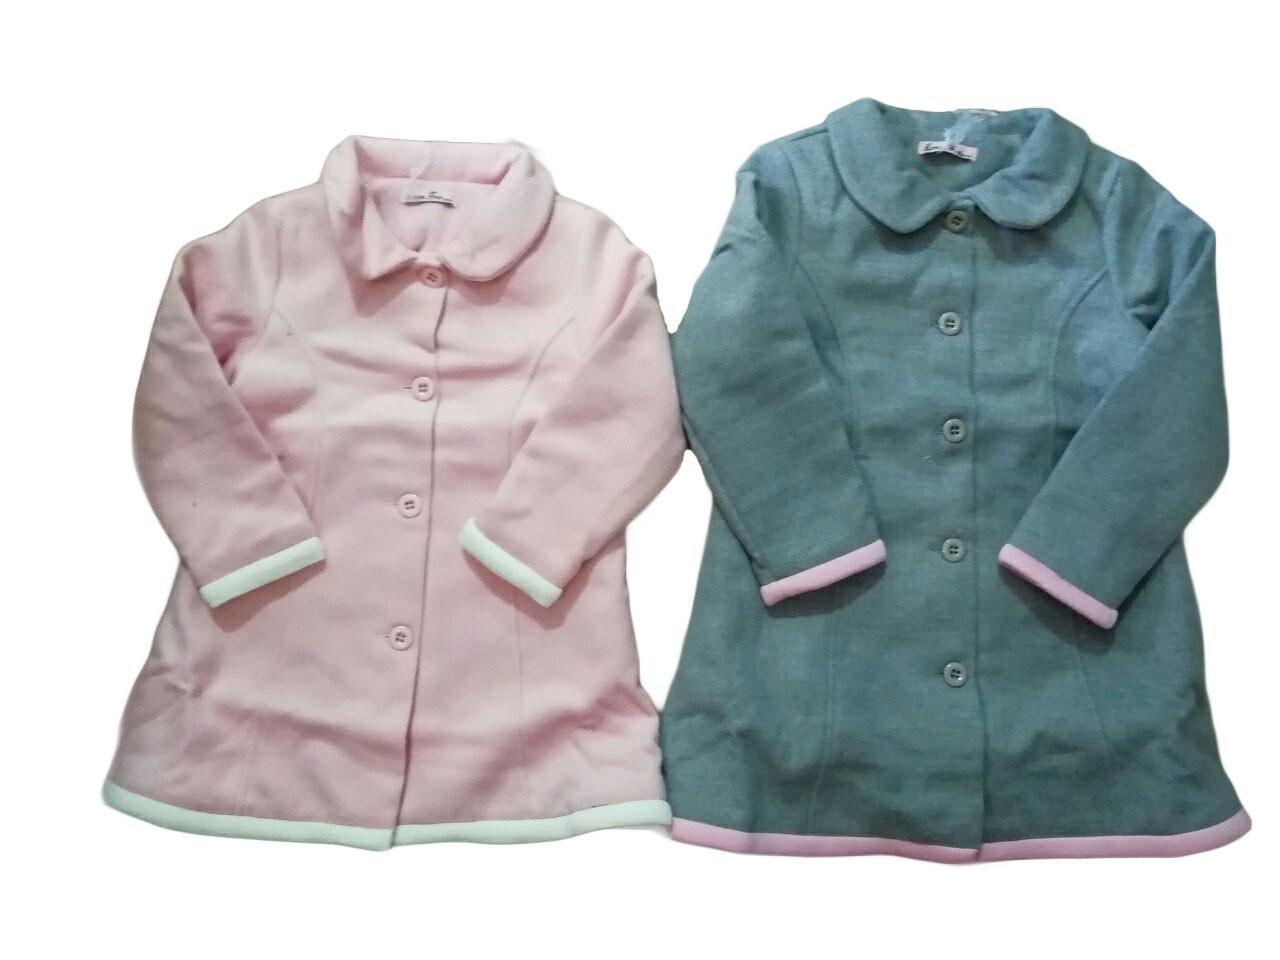 Пальто для девочки,  размеры 3-8 лет, Lemon Tree, арт. FD 7908